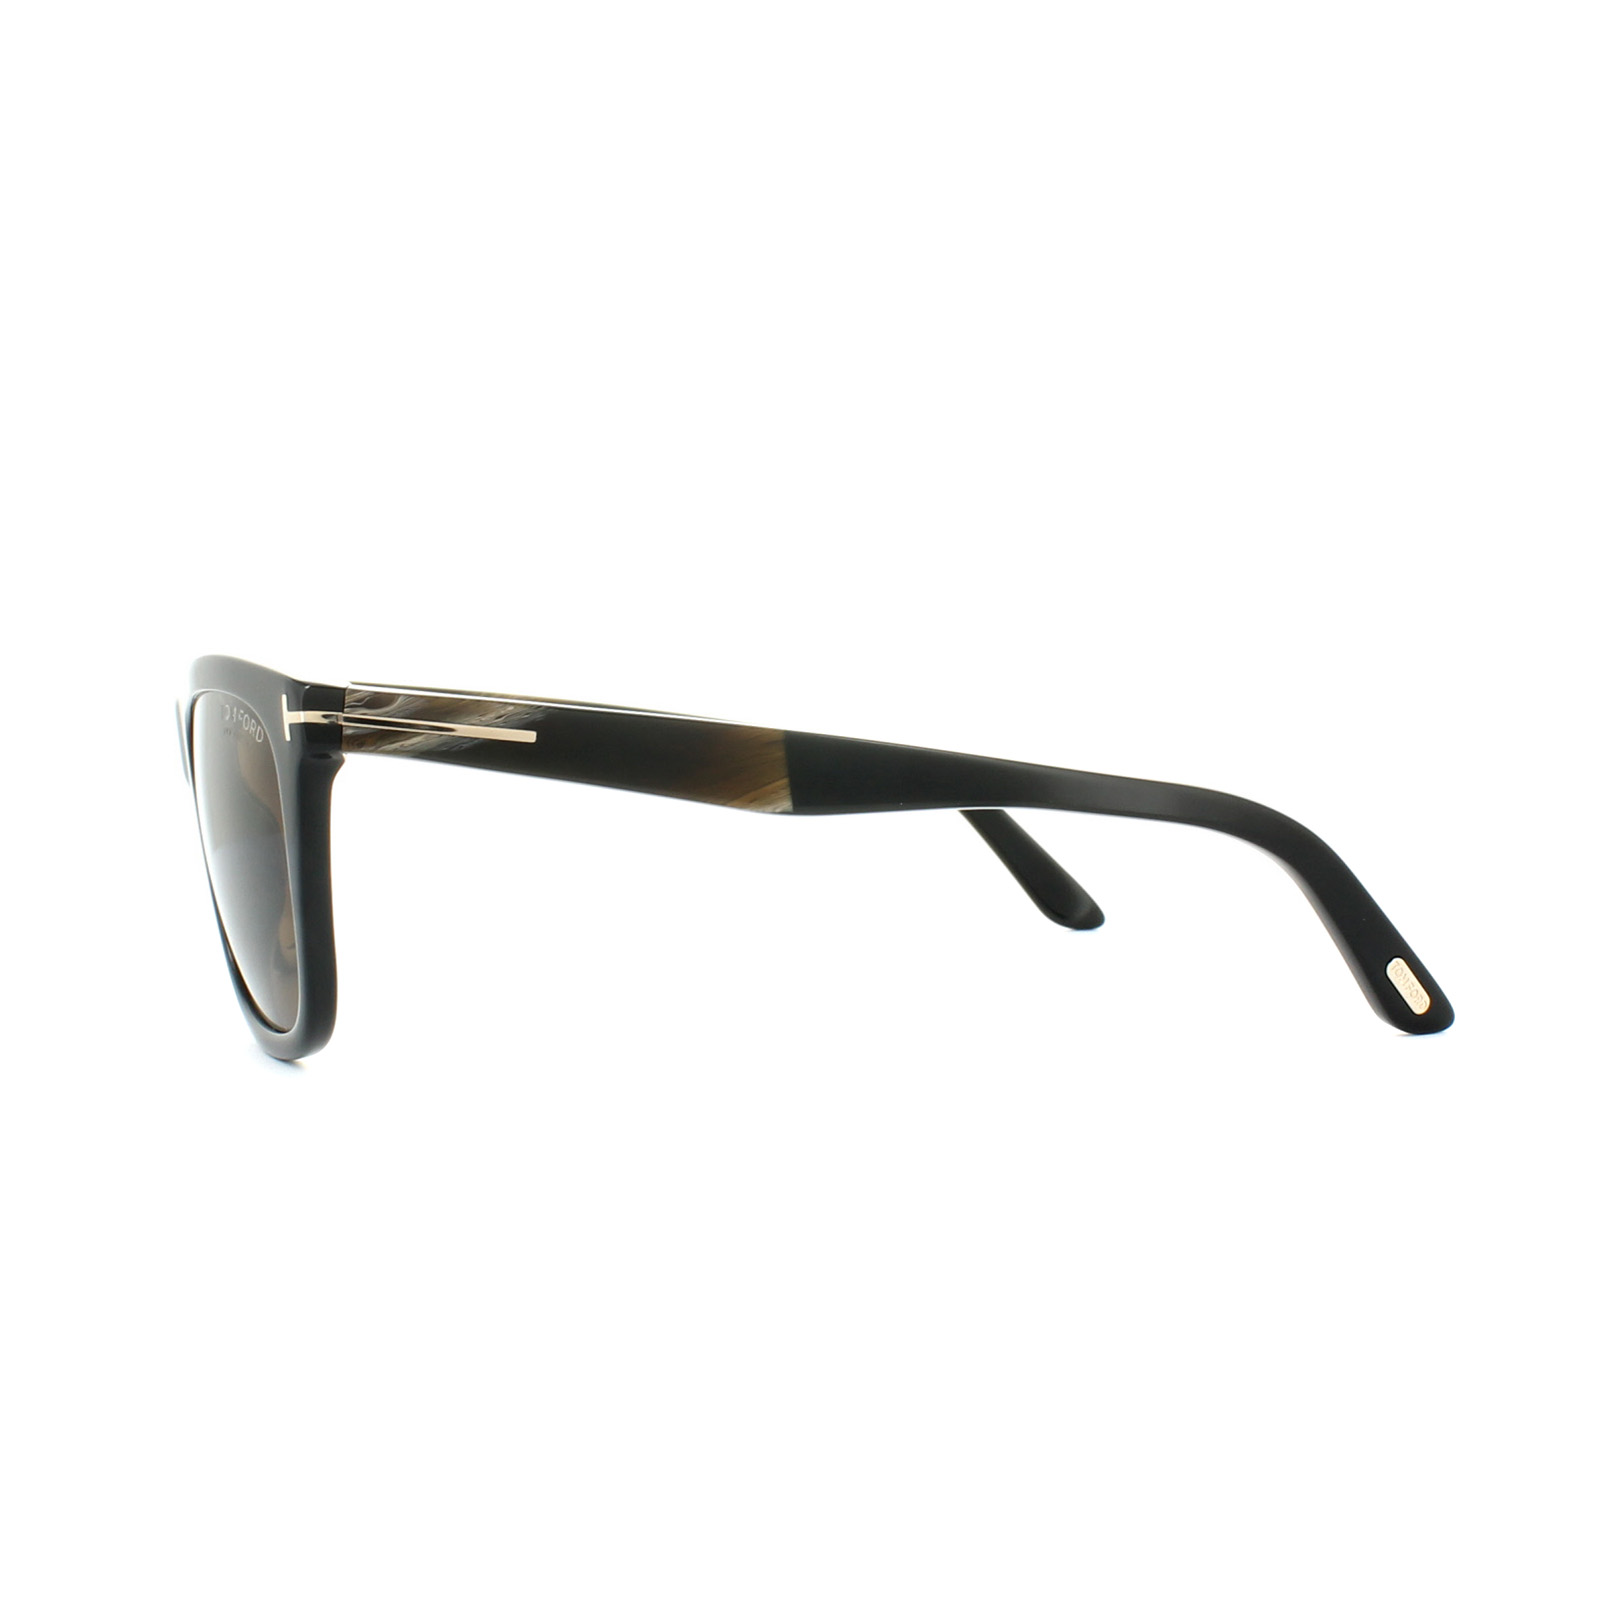 bea97e685eb Sentinel Tom Ford Sunglasses 0500 Andrew 01H Shiny Black Brown Polarized